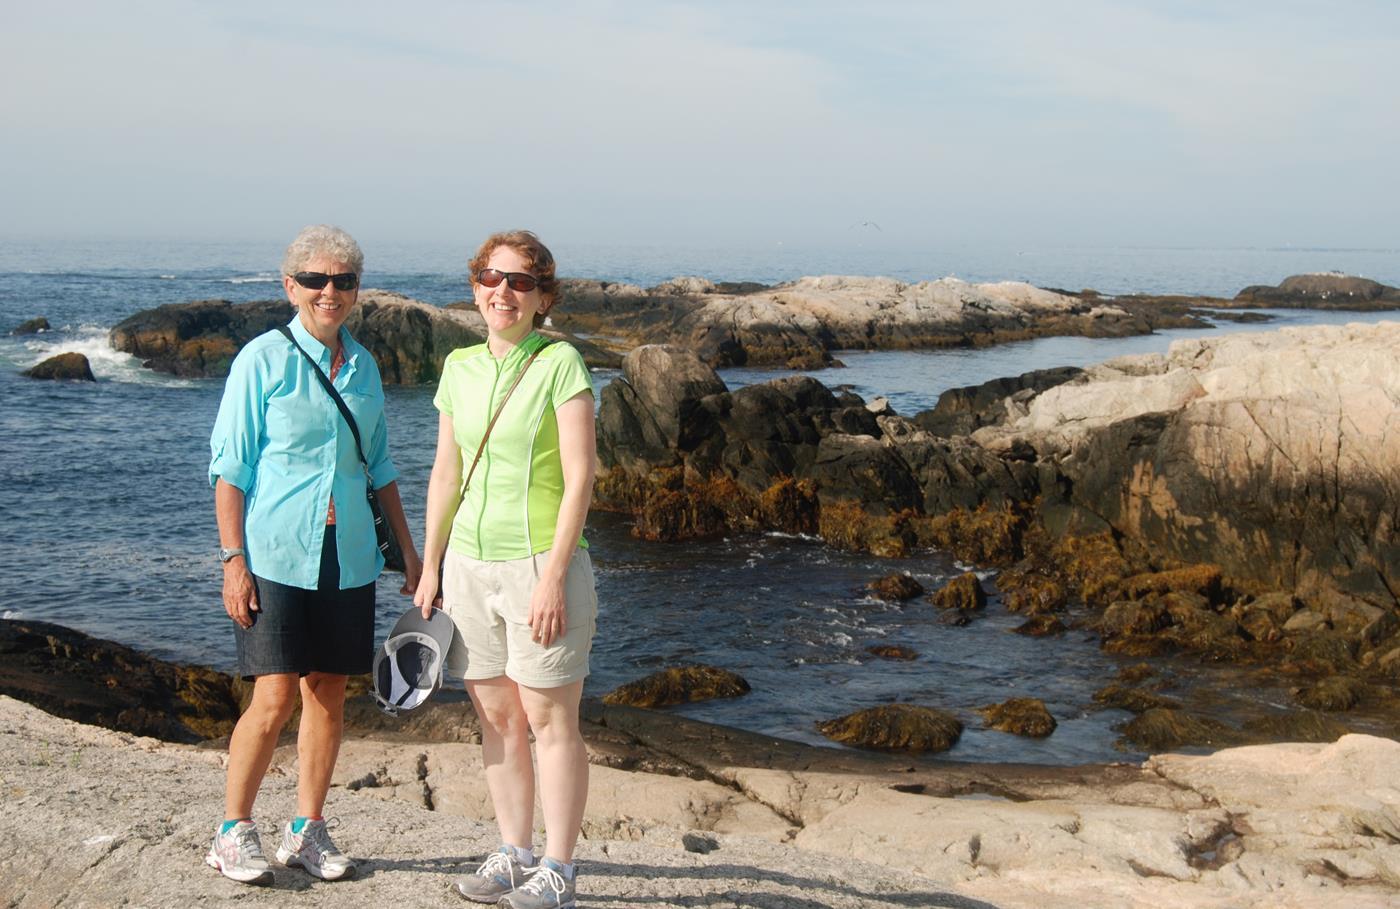 Rhode island newport vacation bike tour